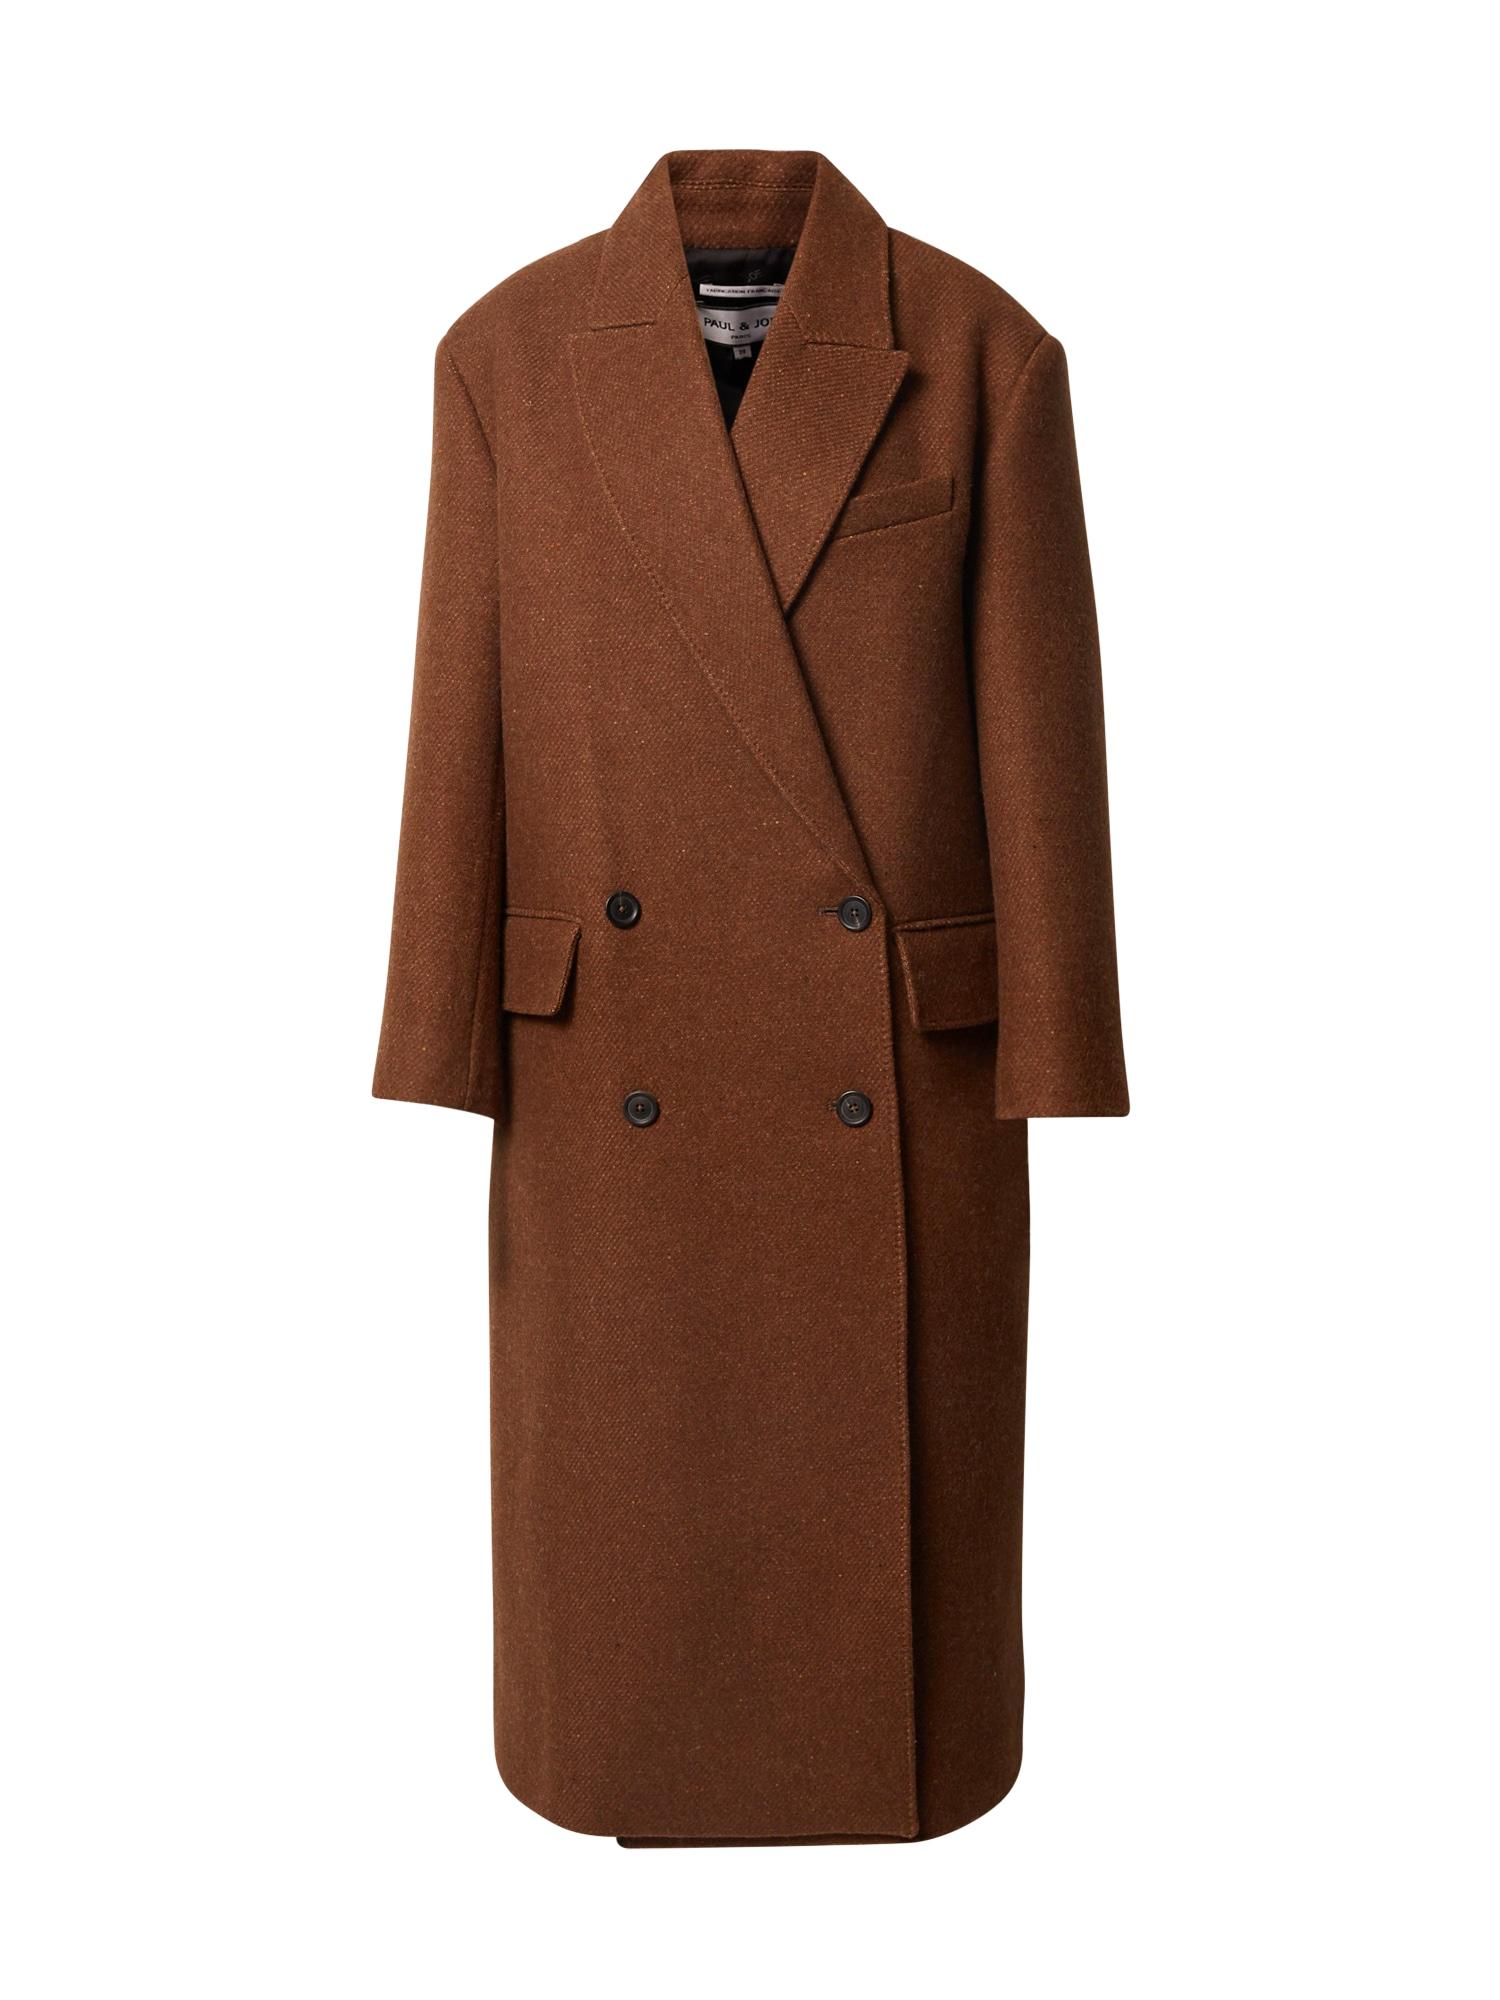 PAUL & JOE Demisezoninis paltas tamsiai ruda